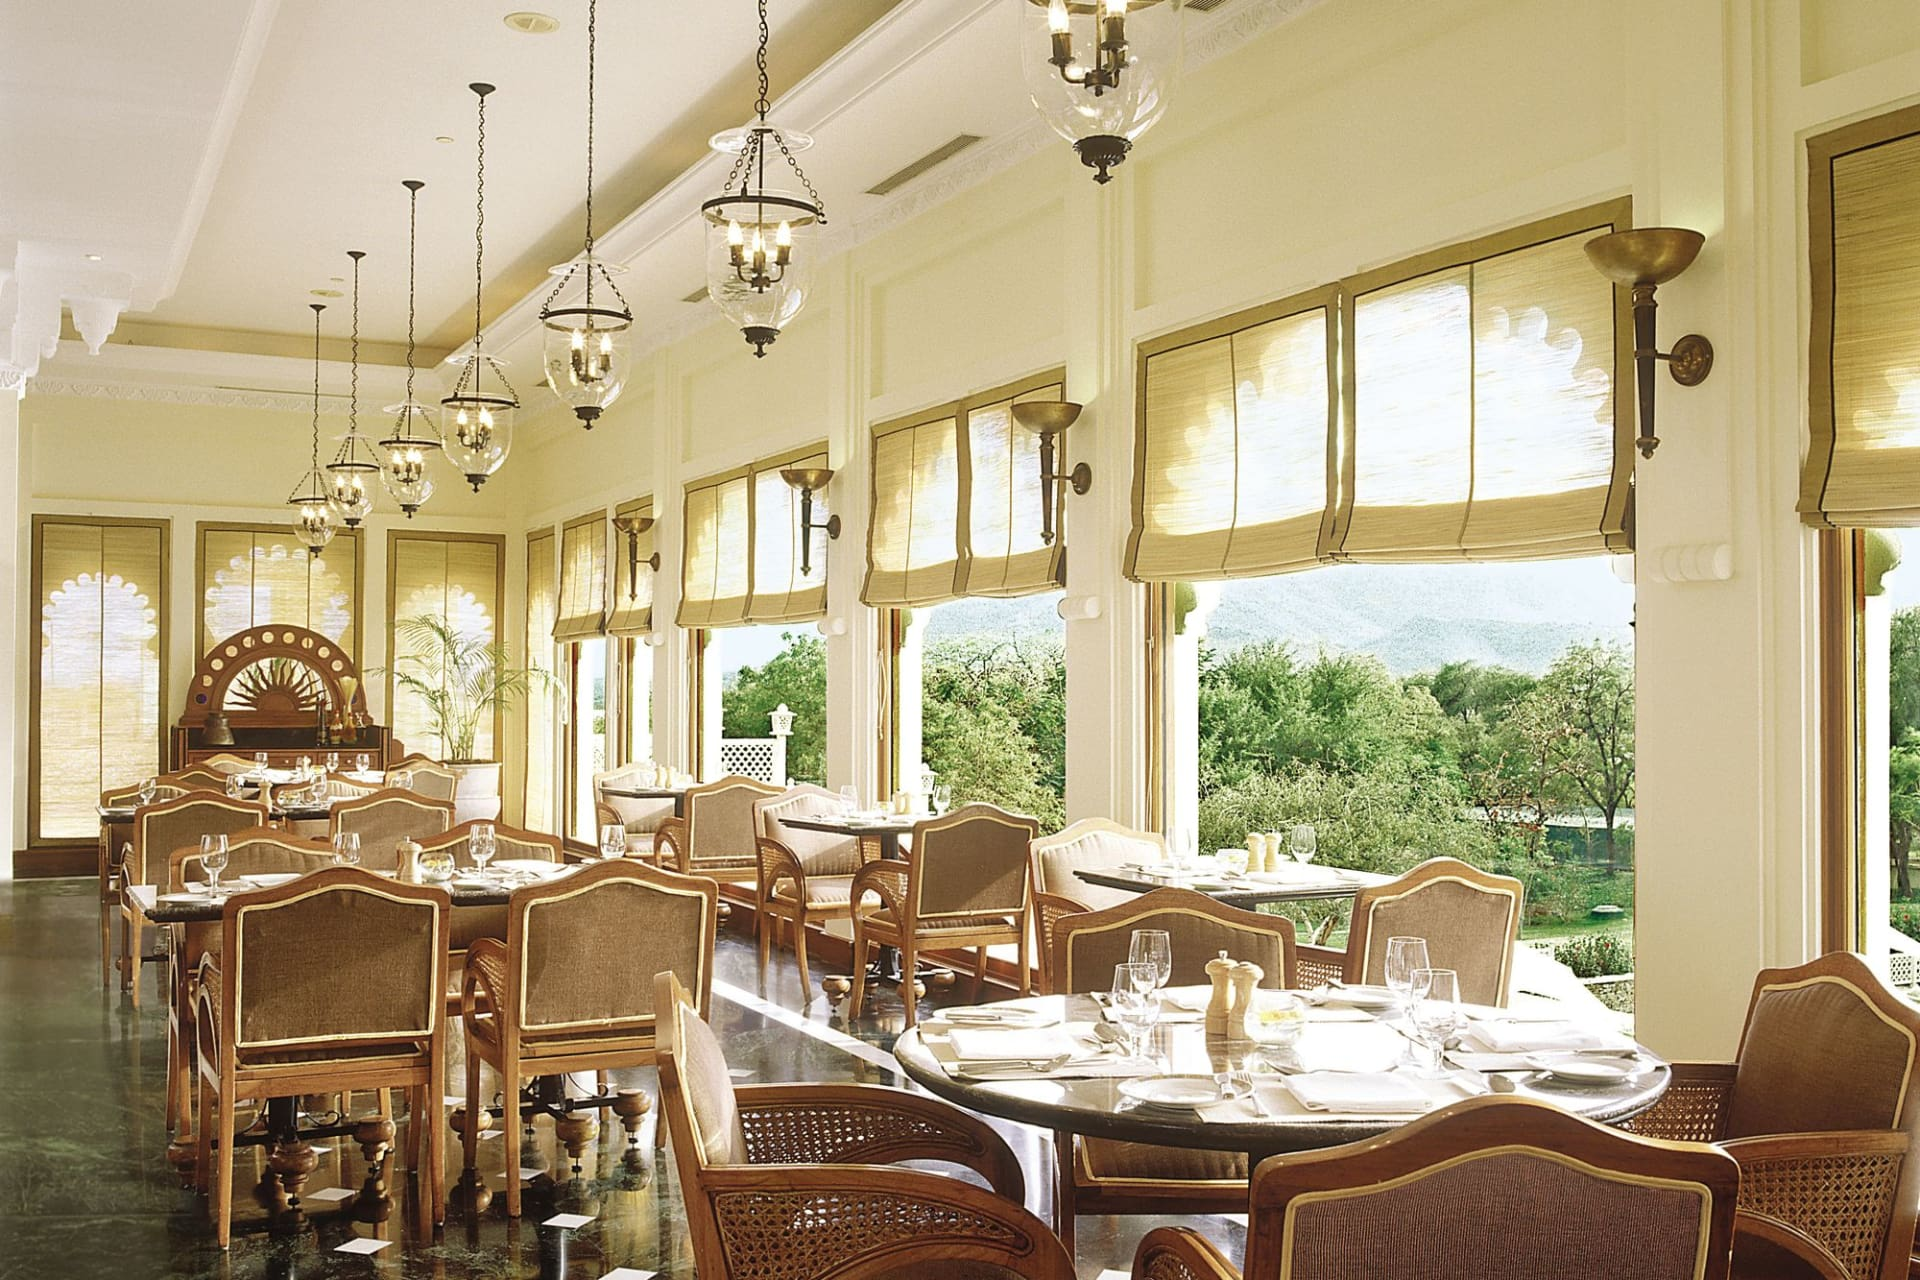 f&b: Aravalli Restaurant